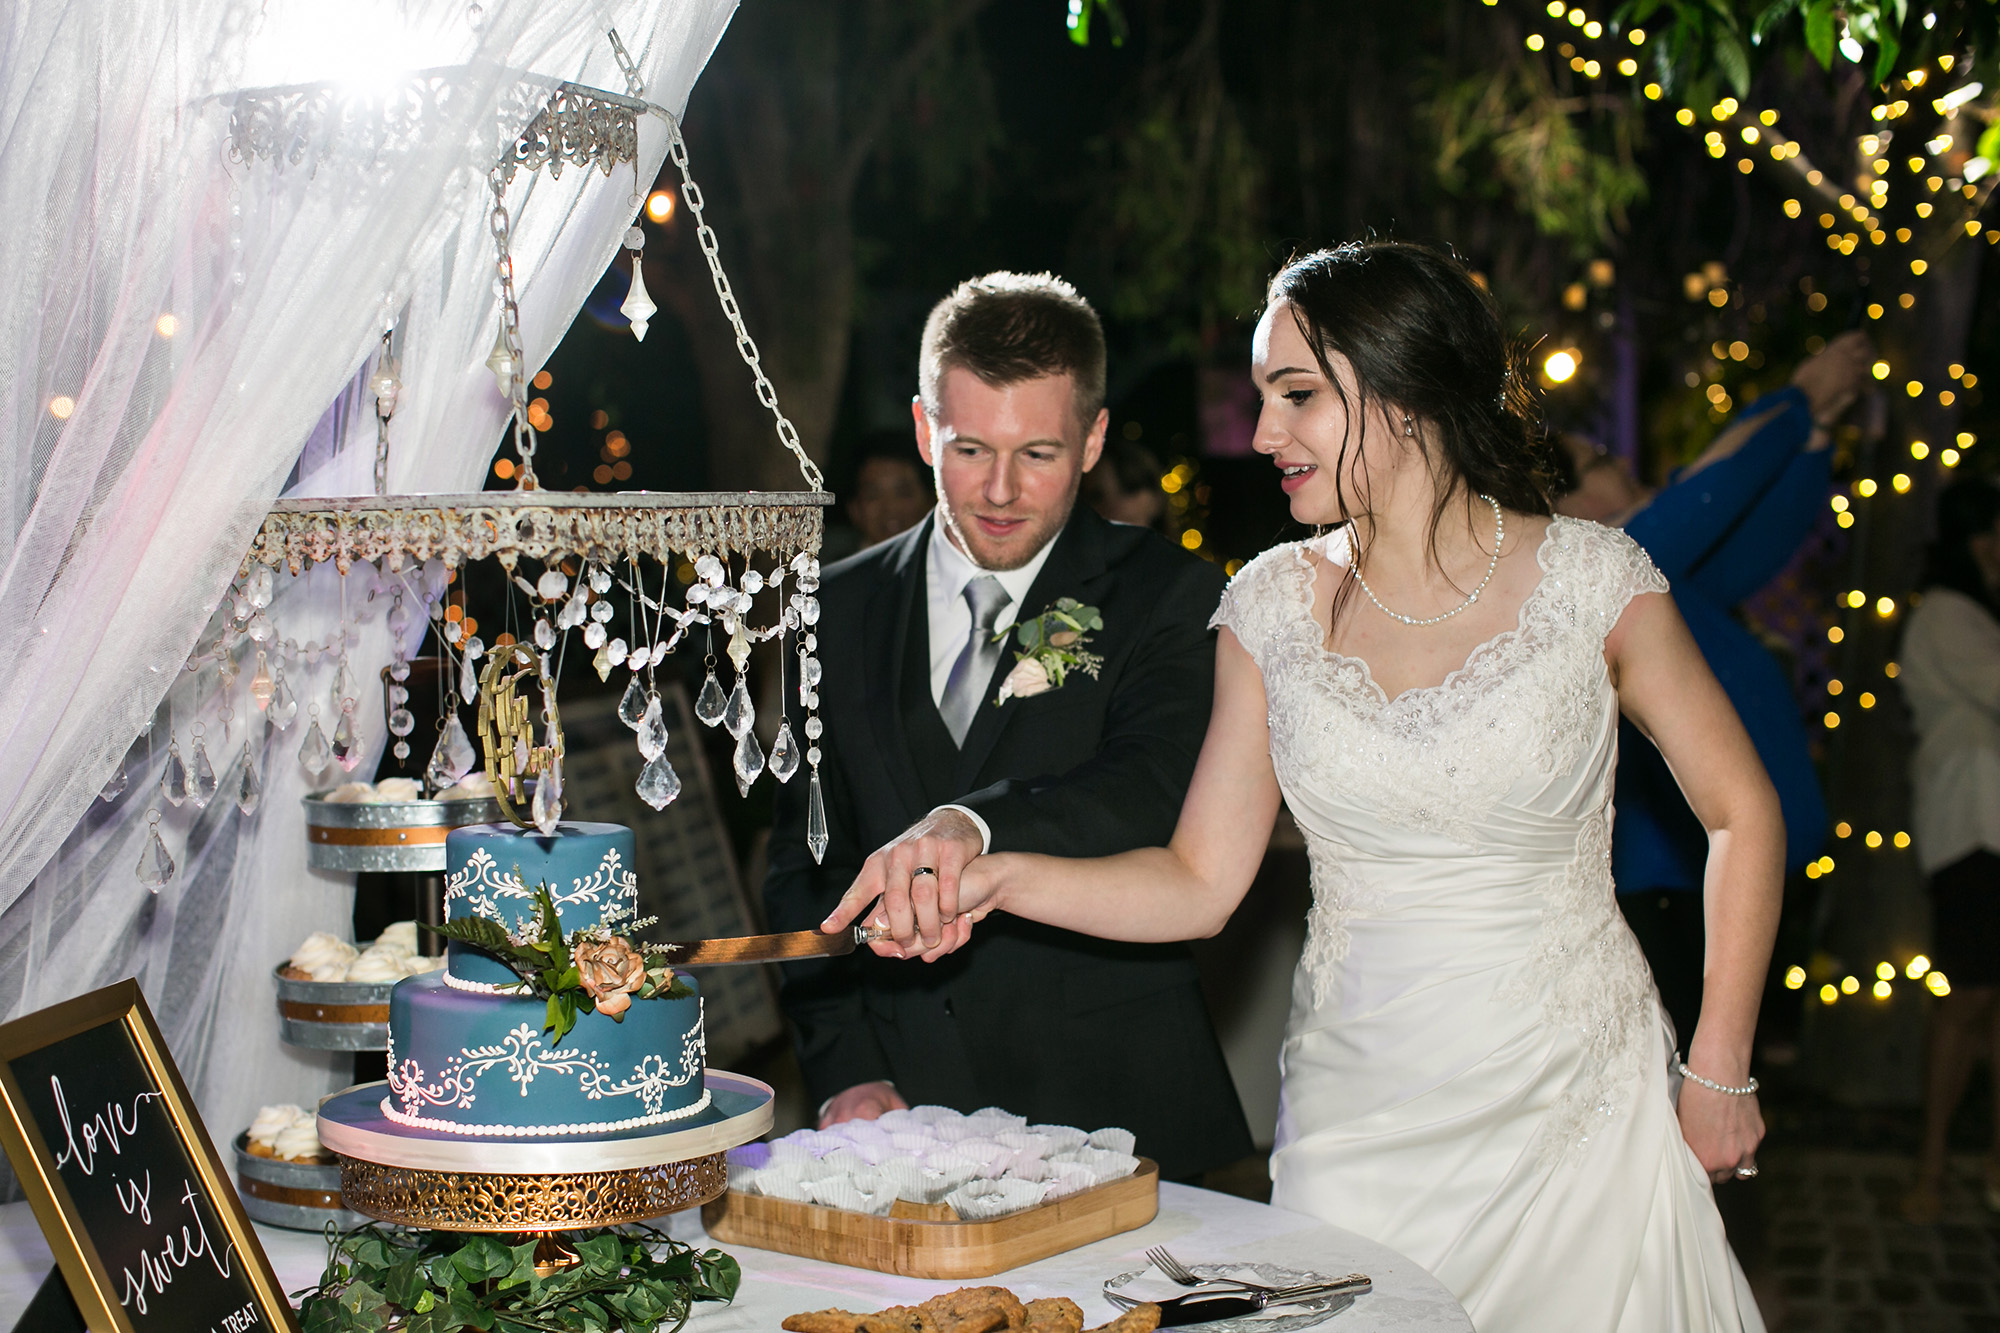 adventure-themed-Christmas-House-wedding-carrie-vines-211.jpg